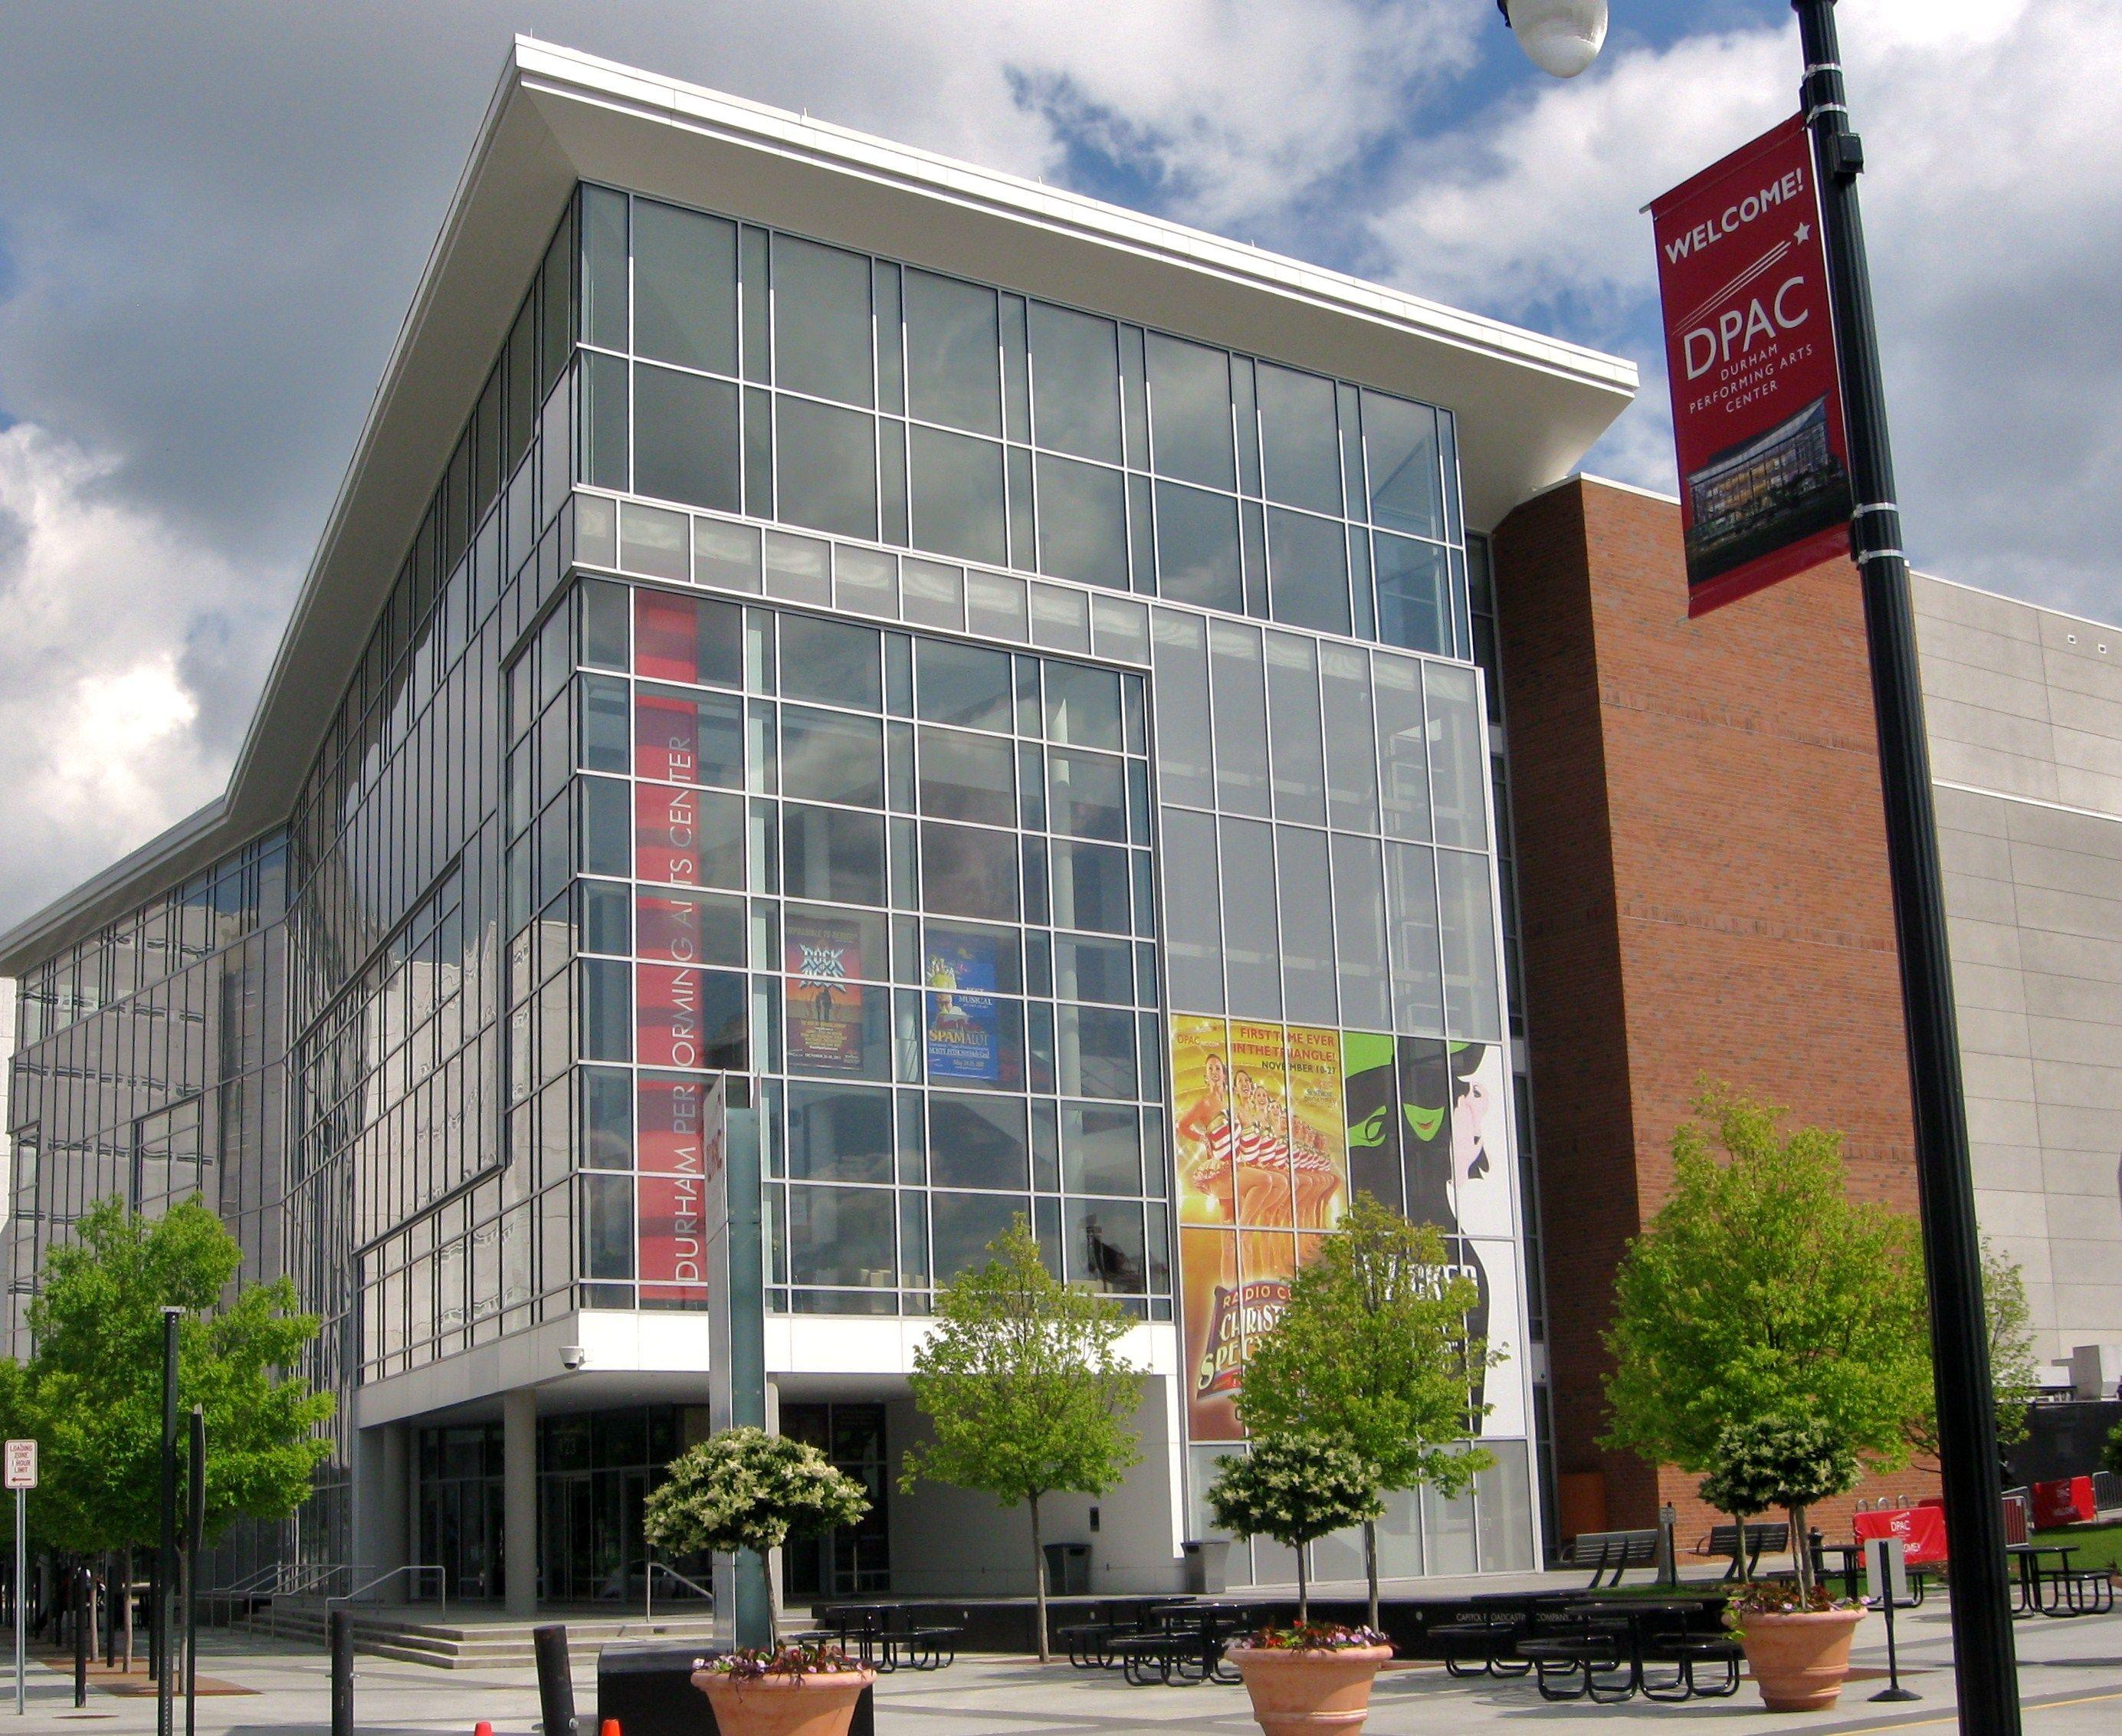 durham performing arts center dpac homeruns in bull. Black Bedroom Furniture Sets. Home Design Ideas